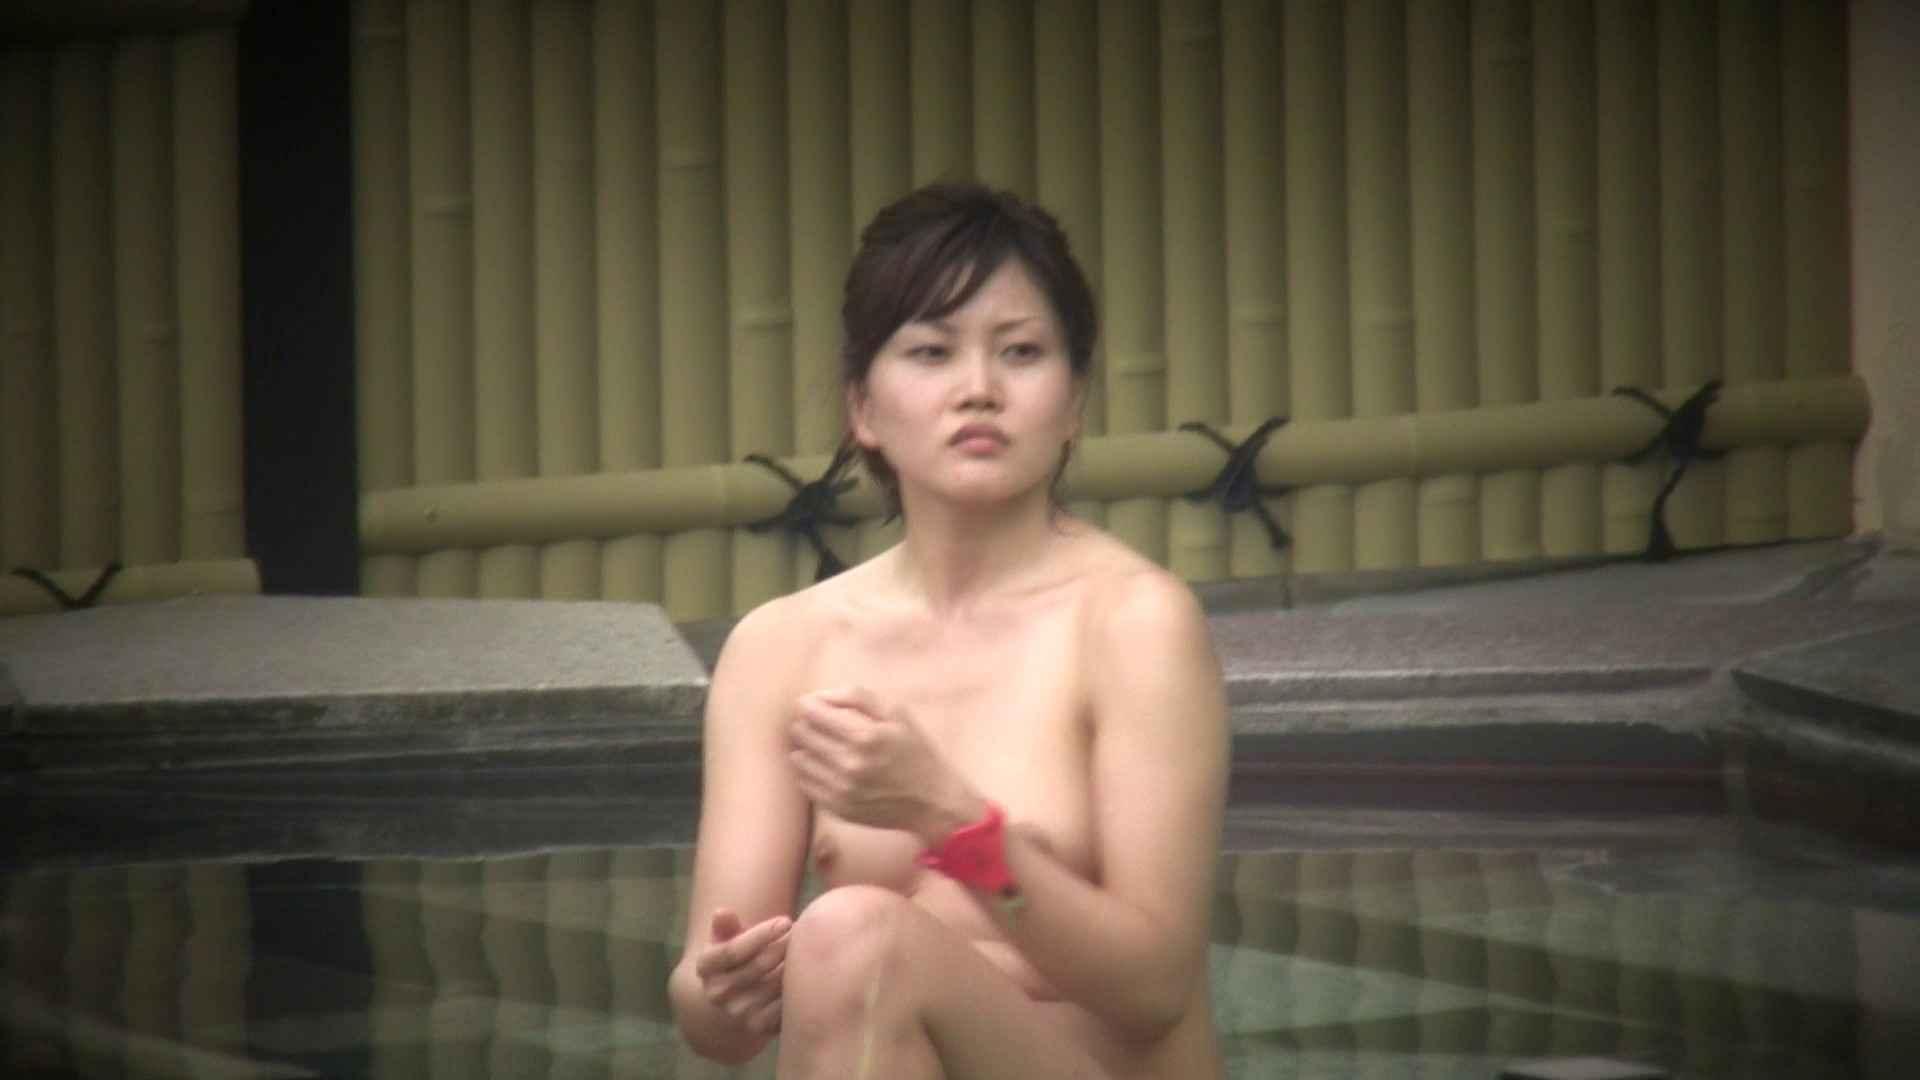 Aquaな露天風呂Vol.125 0 | 0  26連発 7